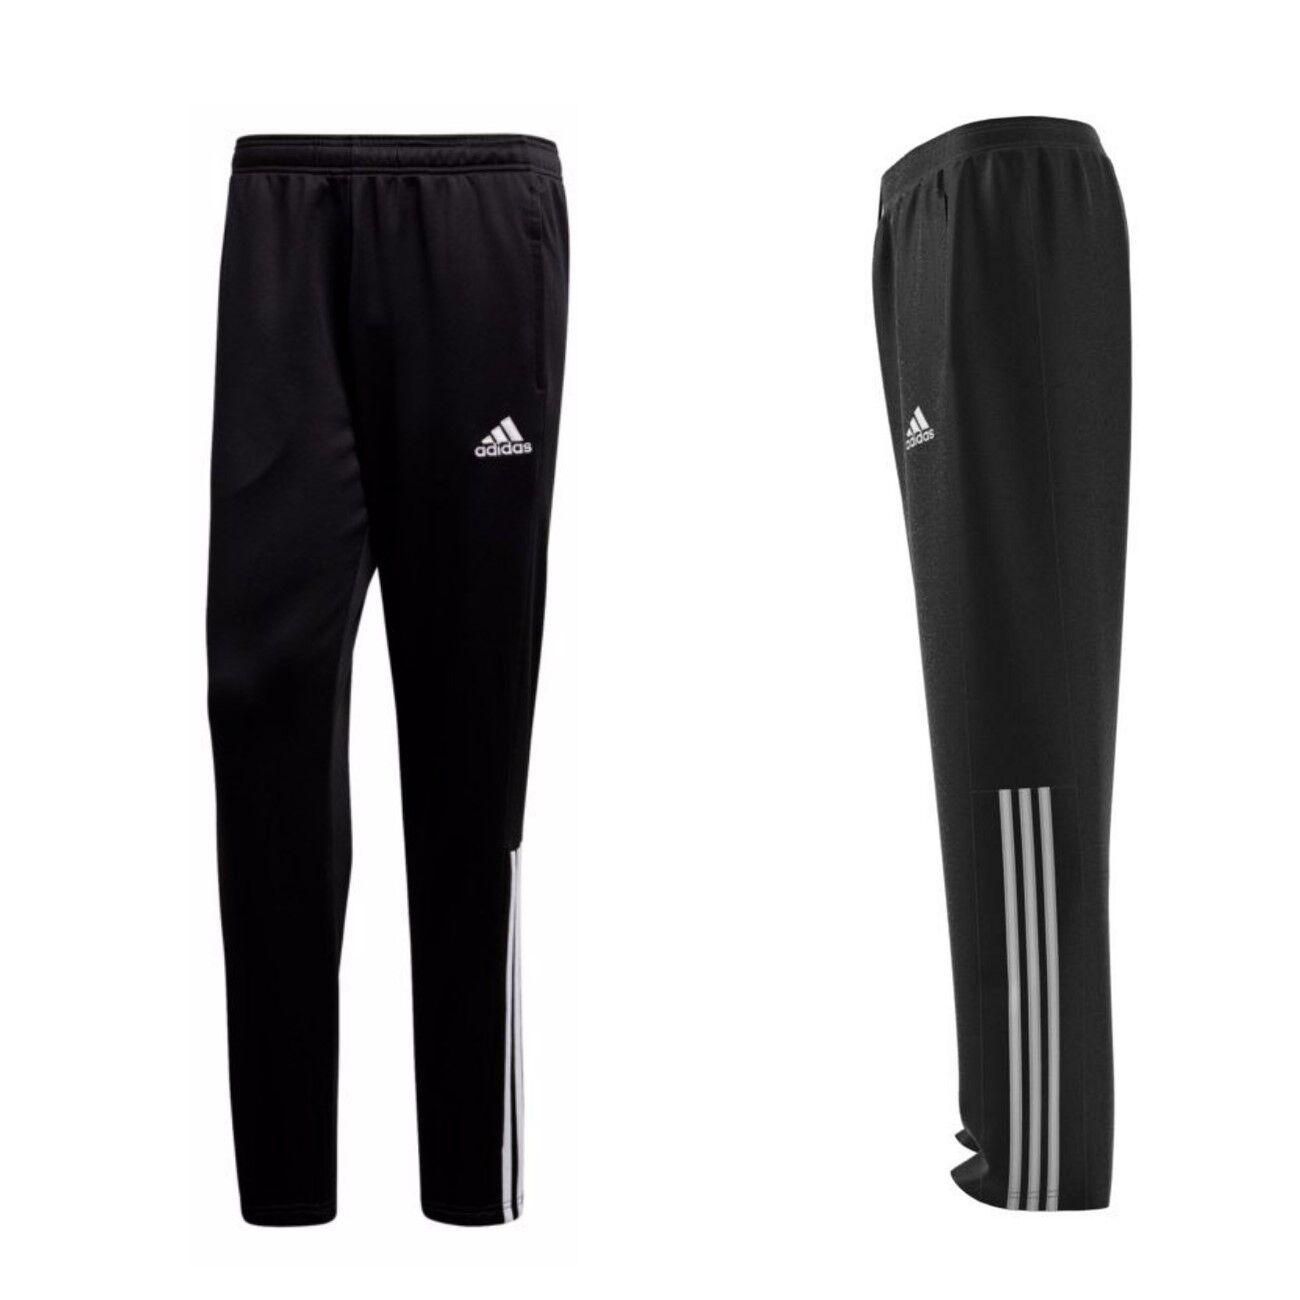 adidas 3 Streifen Sporthose Trainingshose Jogginghose Pant Herren Männer Fußball